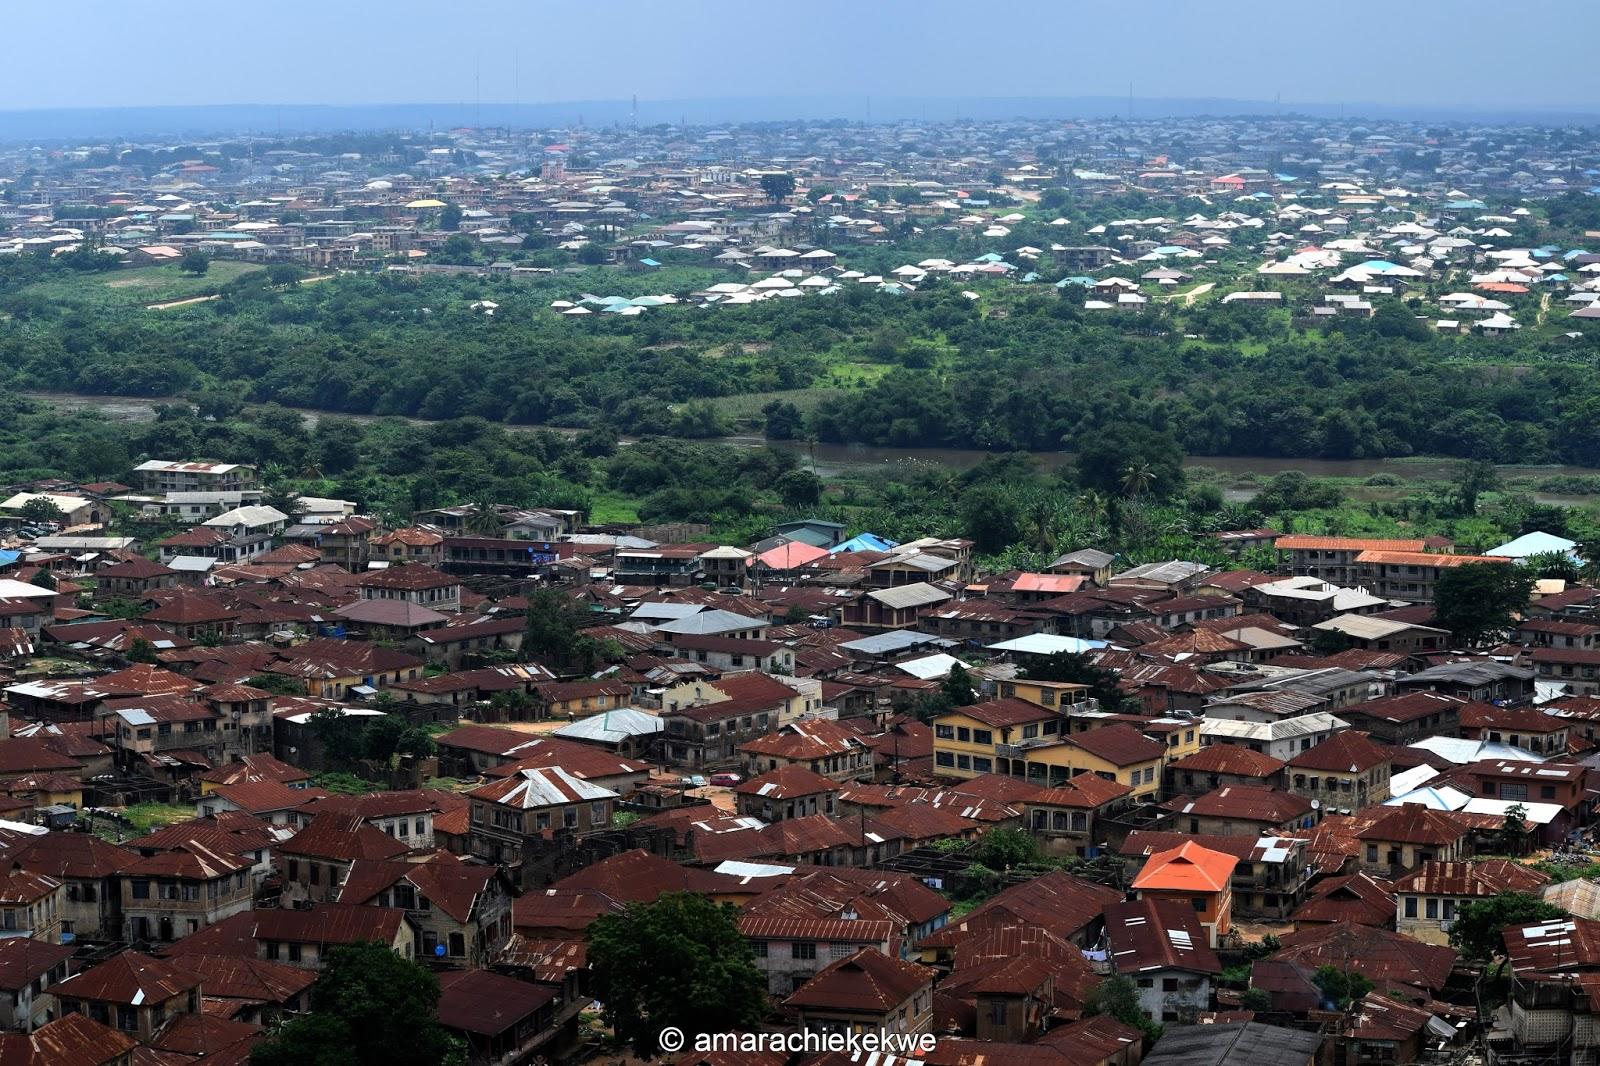 Places to visit in Nigeria -Abeokuta scenery